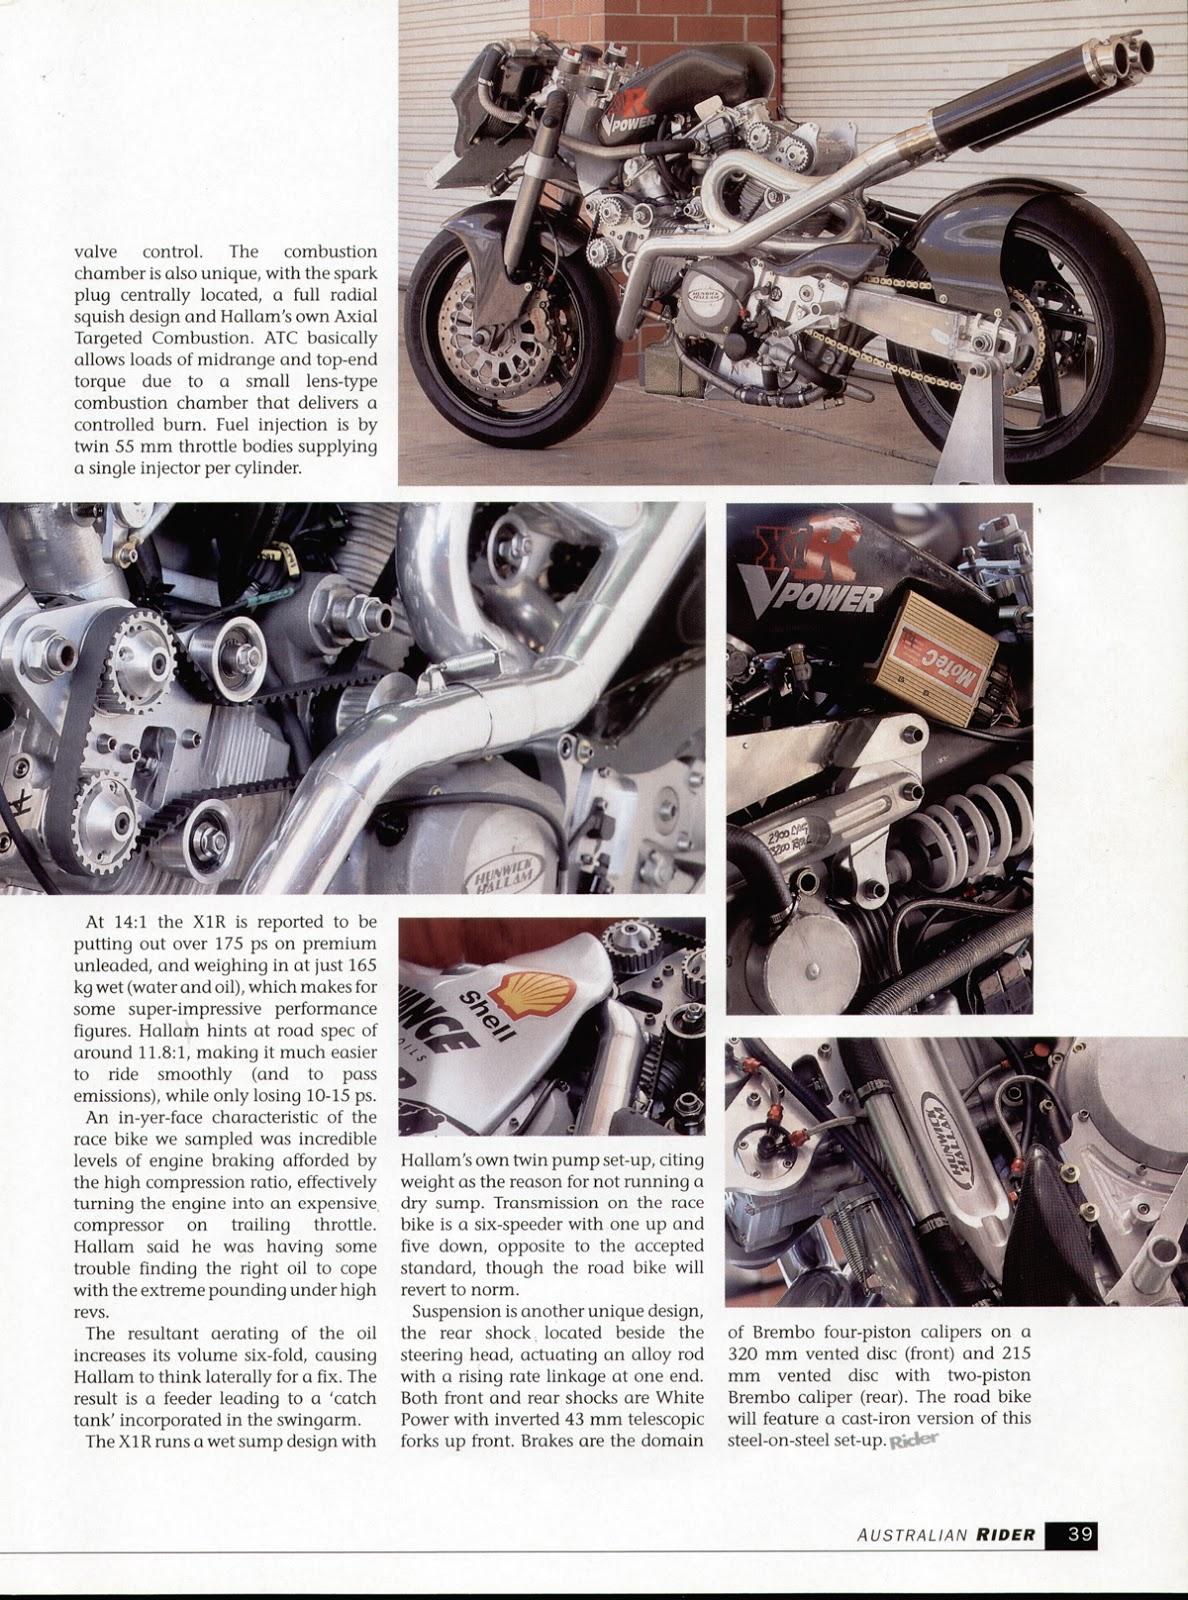 Hunwick Hallam Australian Rider Article